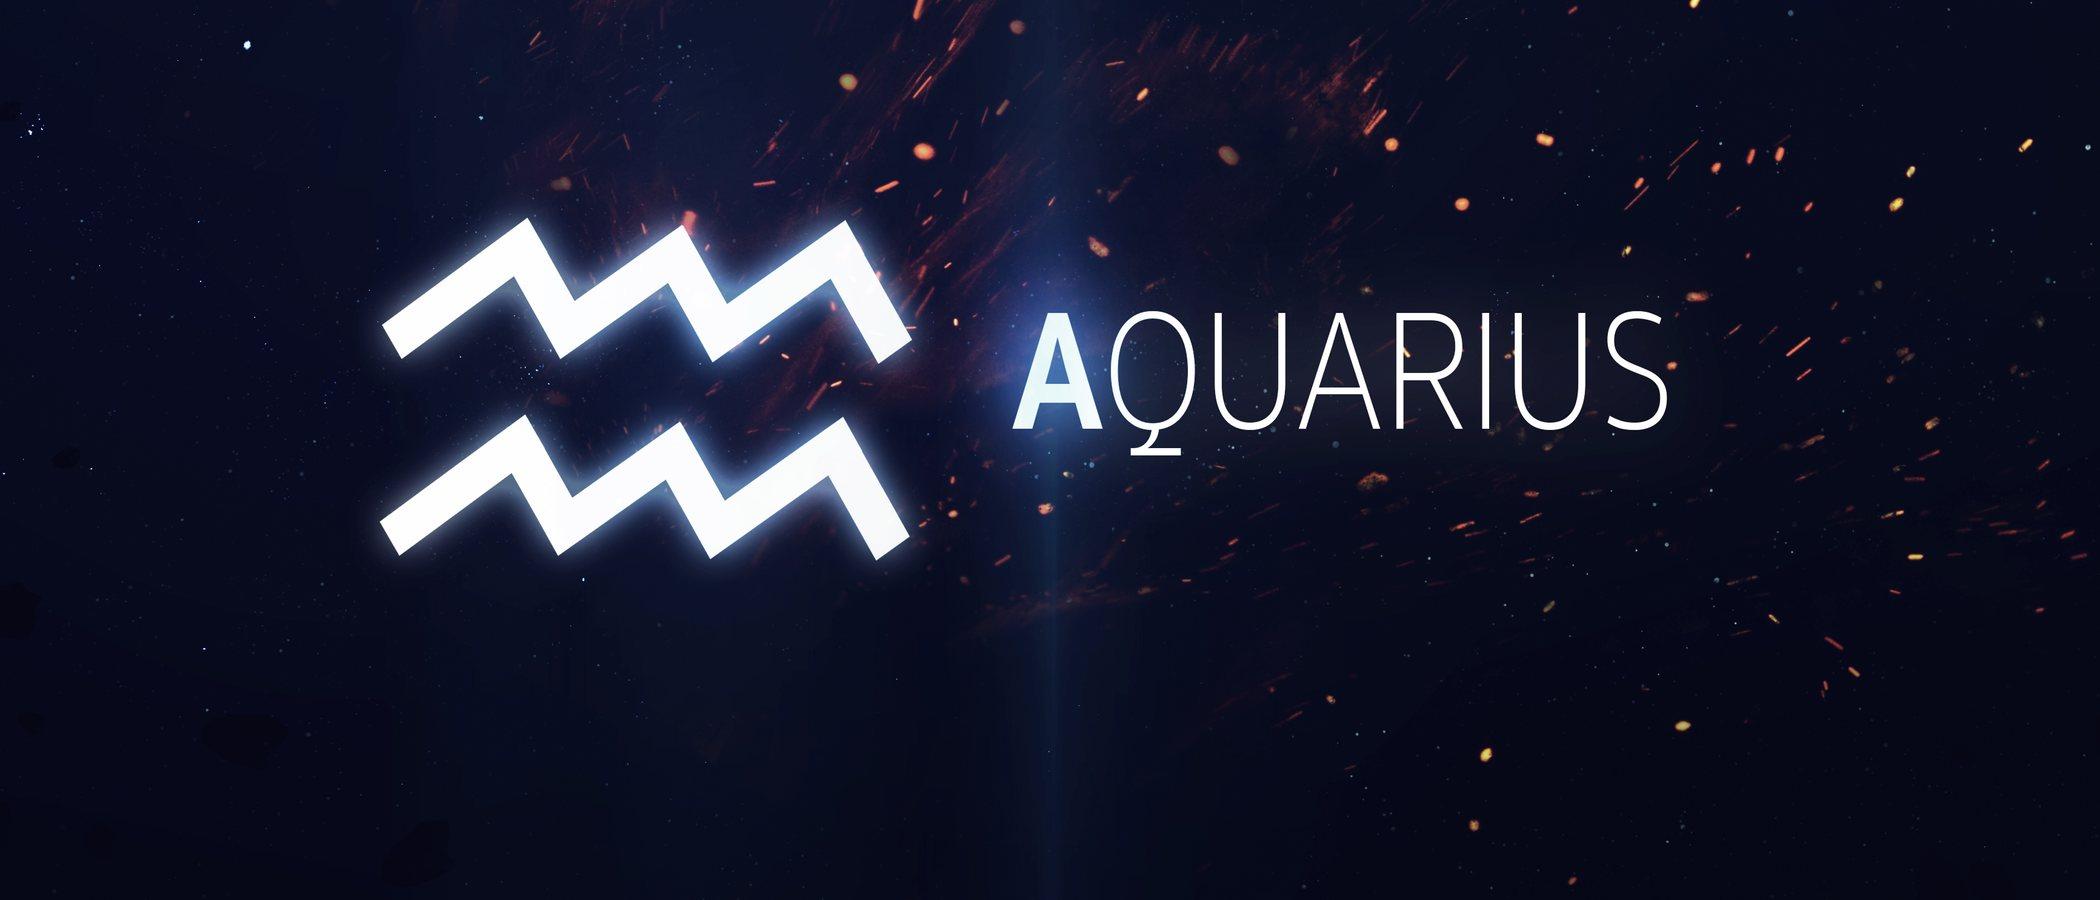 Horóscopo noviembre 2019: Acuario